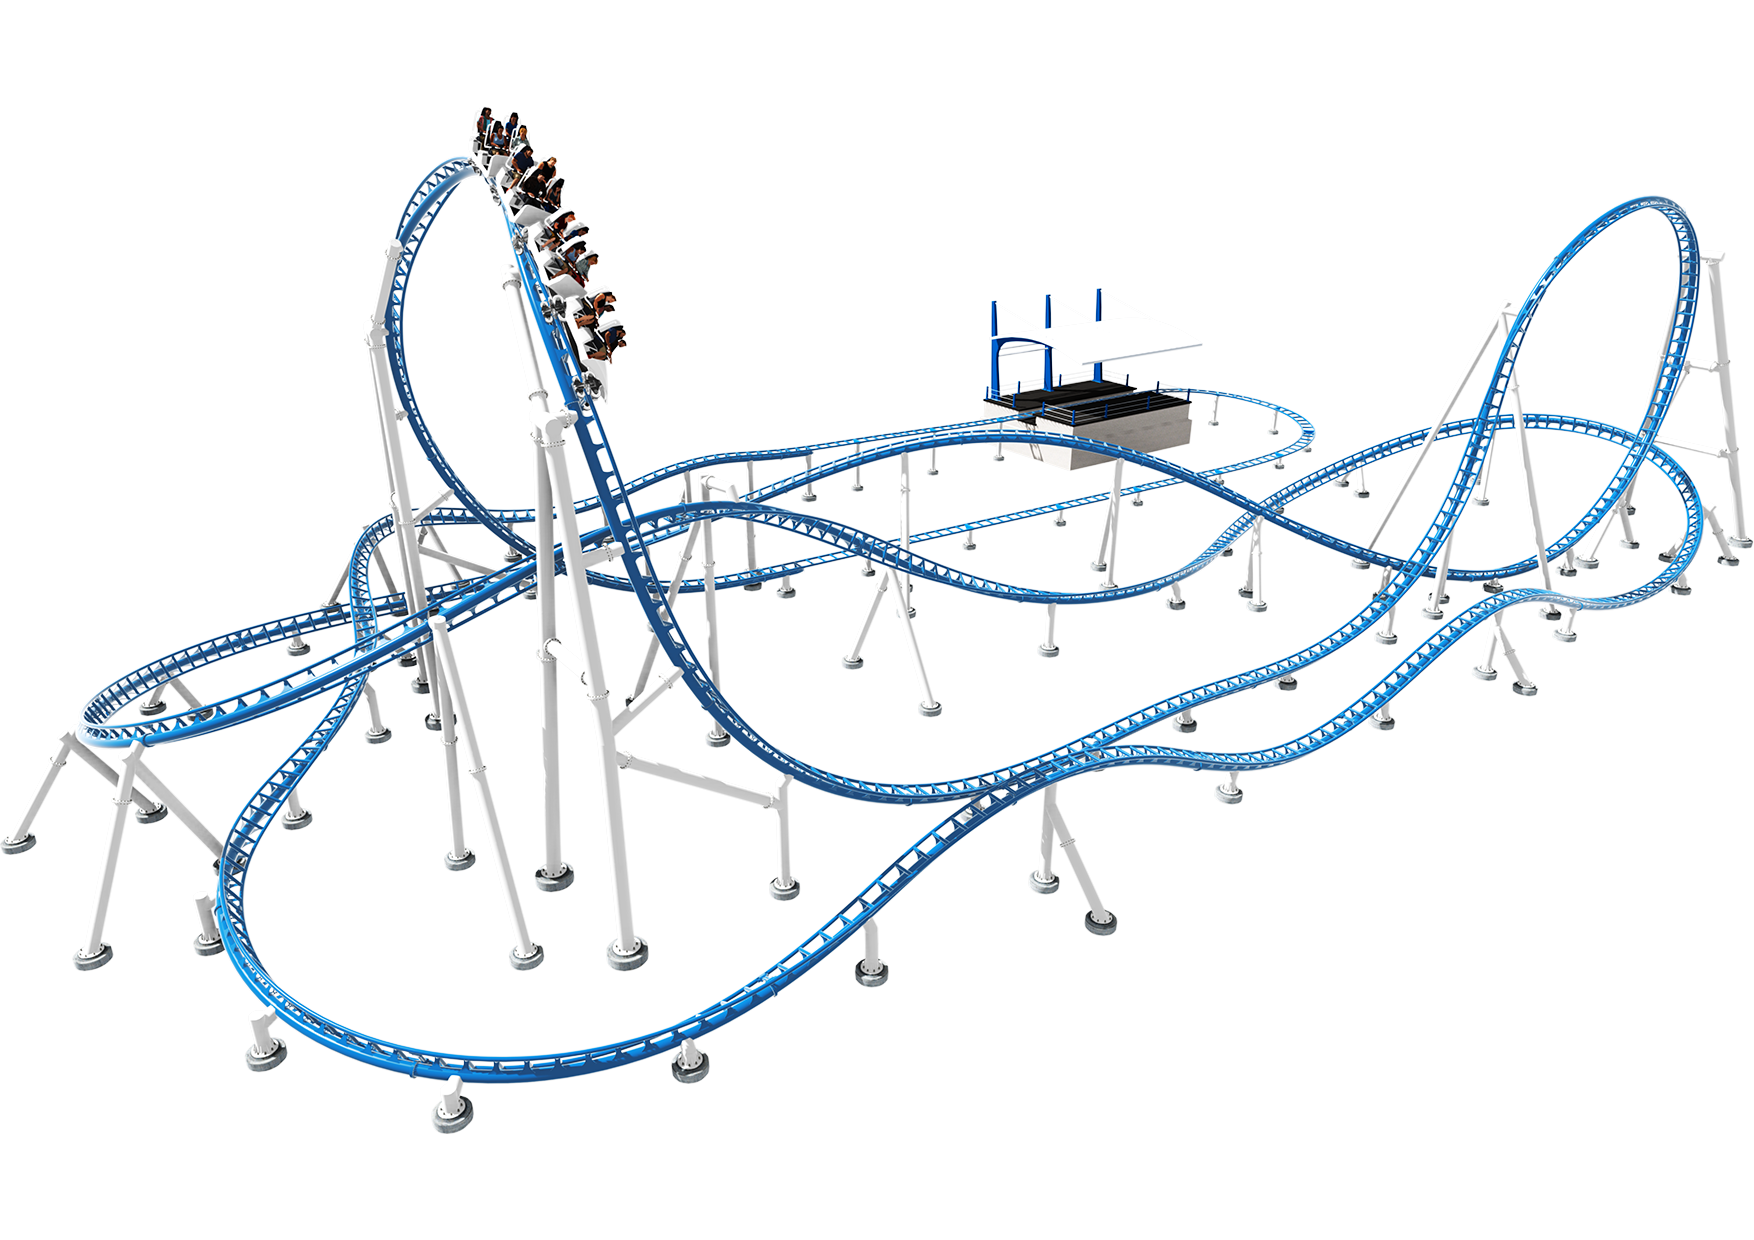 Intamin Sample Layout LSM Single Launch Roller Coaster